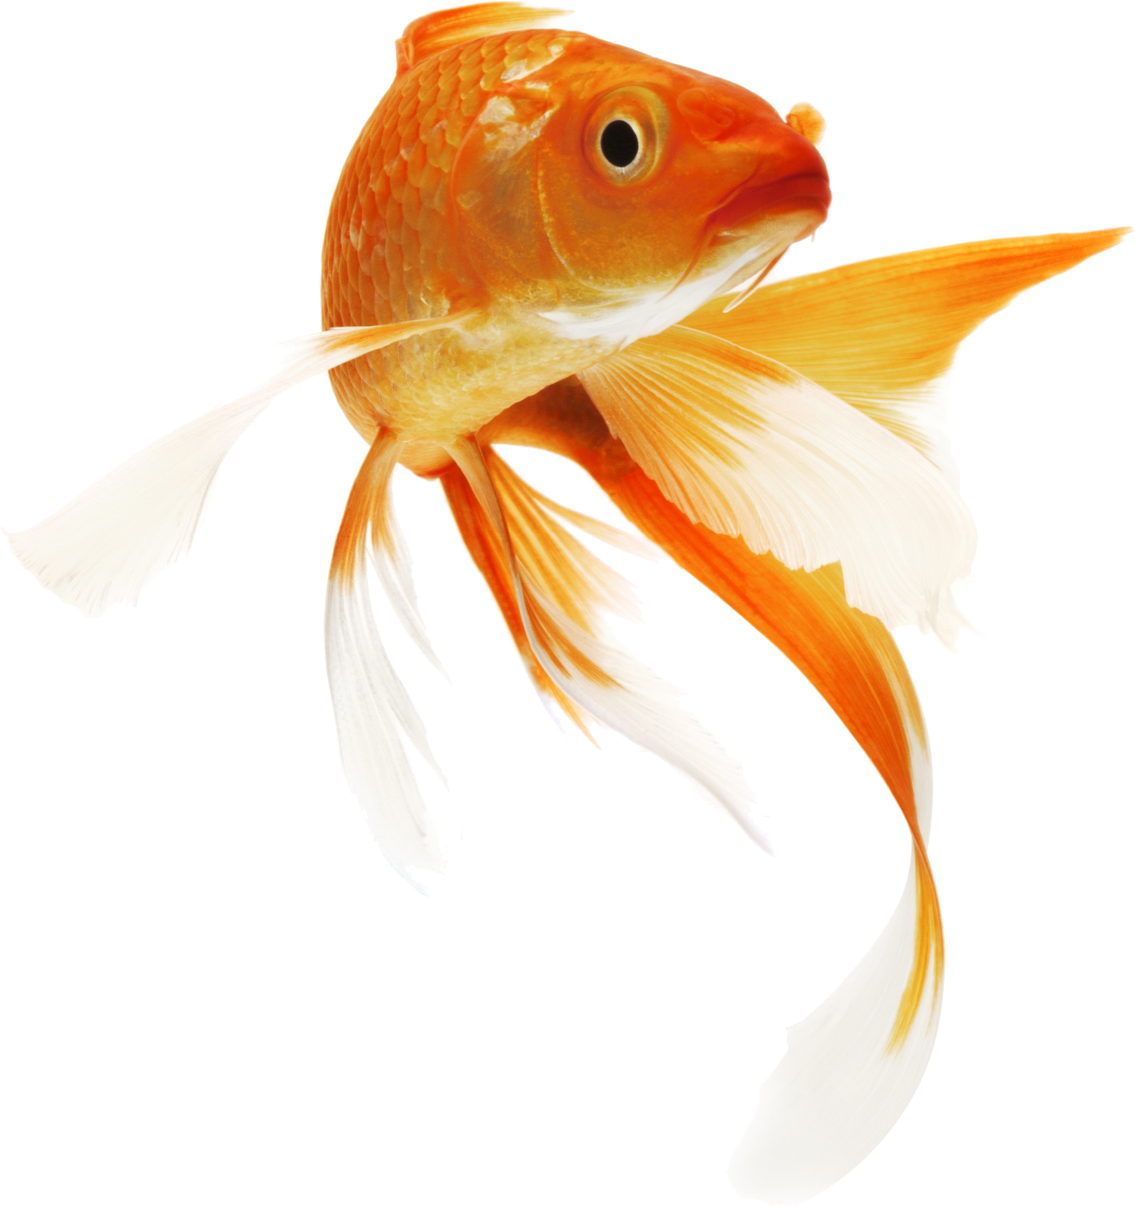 Fish Png Pic Golden Fish Goldfish Koi Carp Fish